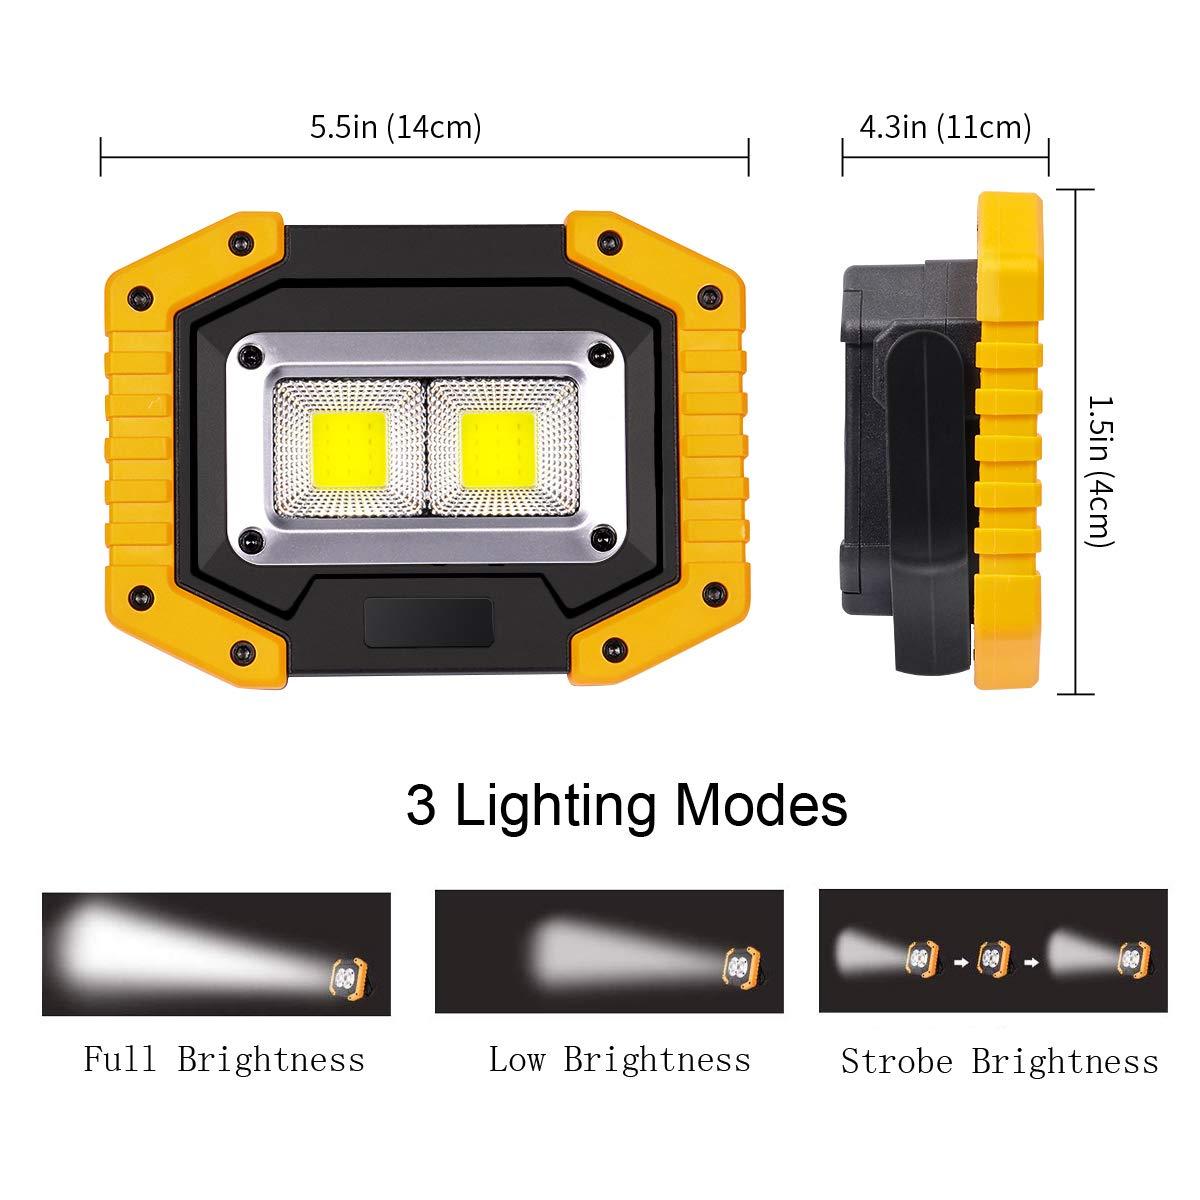 Pesca Luces de Seguridad de Emergencia Luz de Inundaci/ón Port/átil 30W USB Camping 3 Modos Linterna al Aire Libre Impermeable para la Reparaci/ón de Autom/óviles Luz de Trabajo LED Recargable